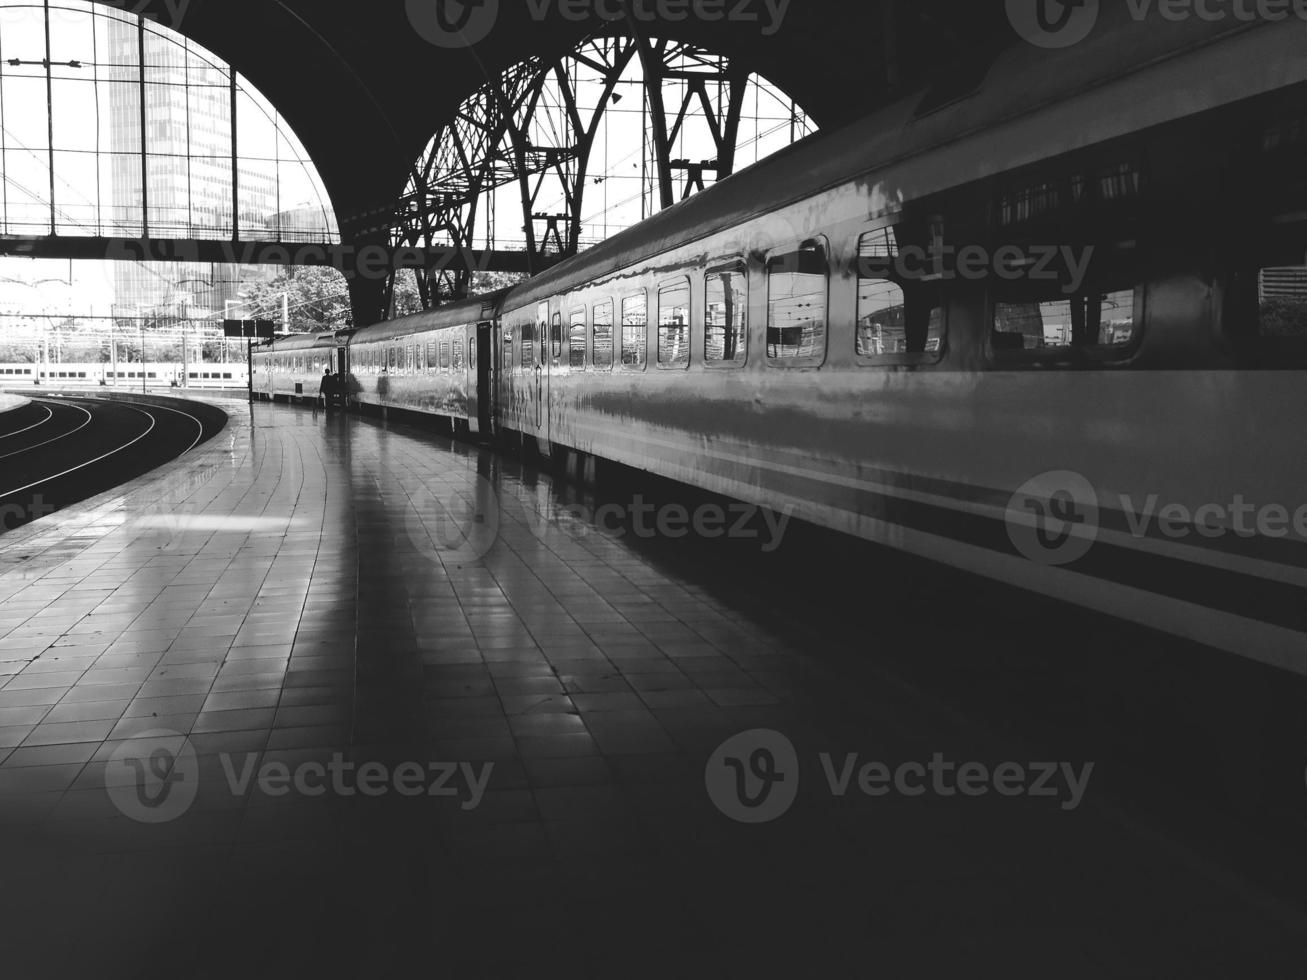 Train station, the trains and platform photo